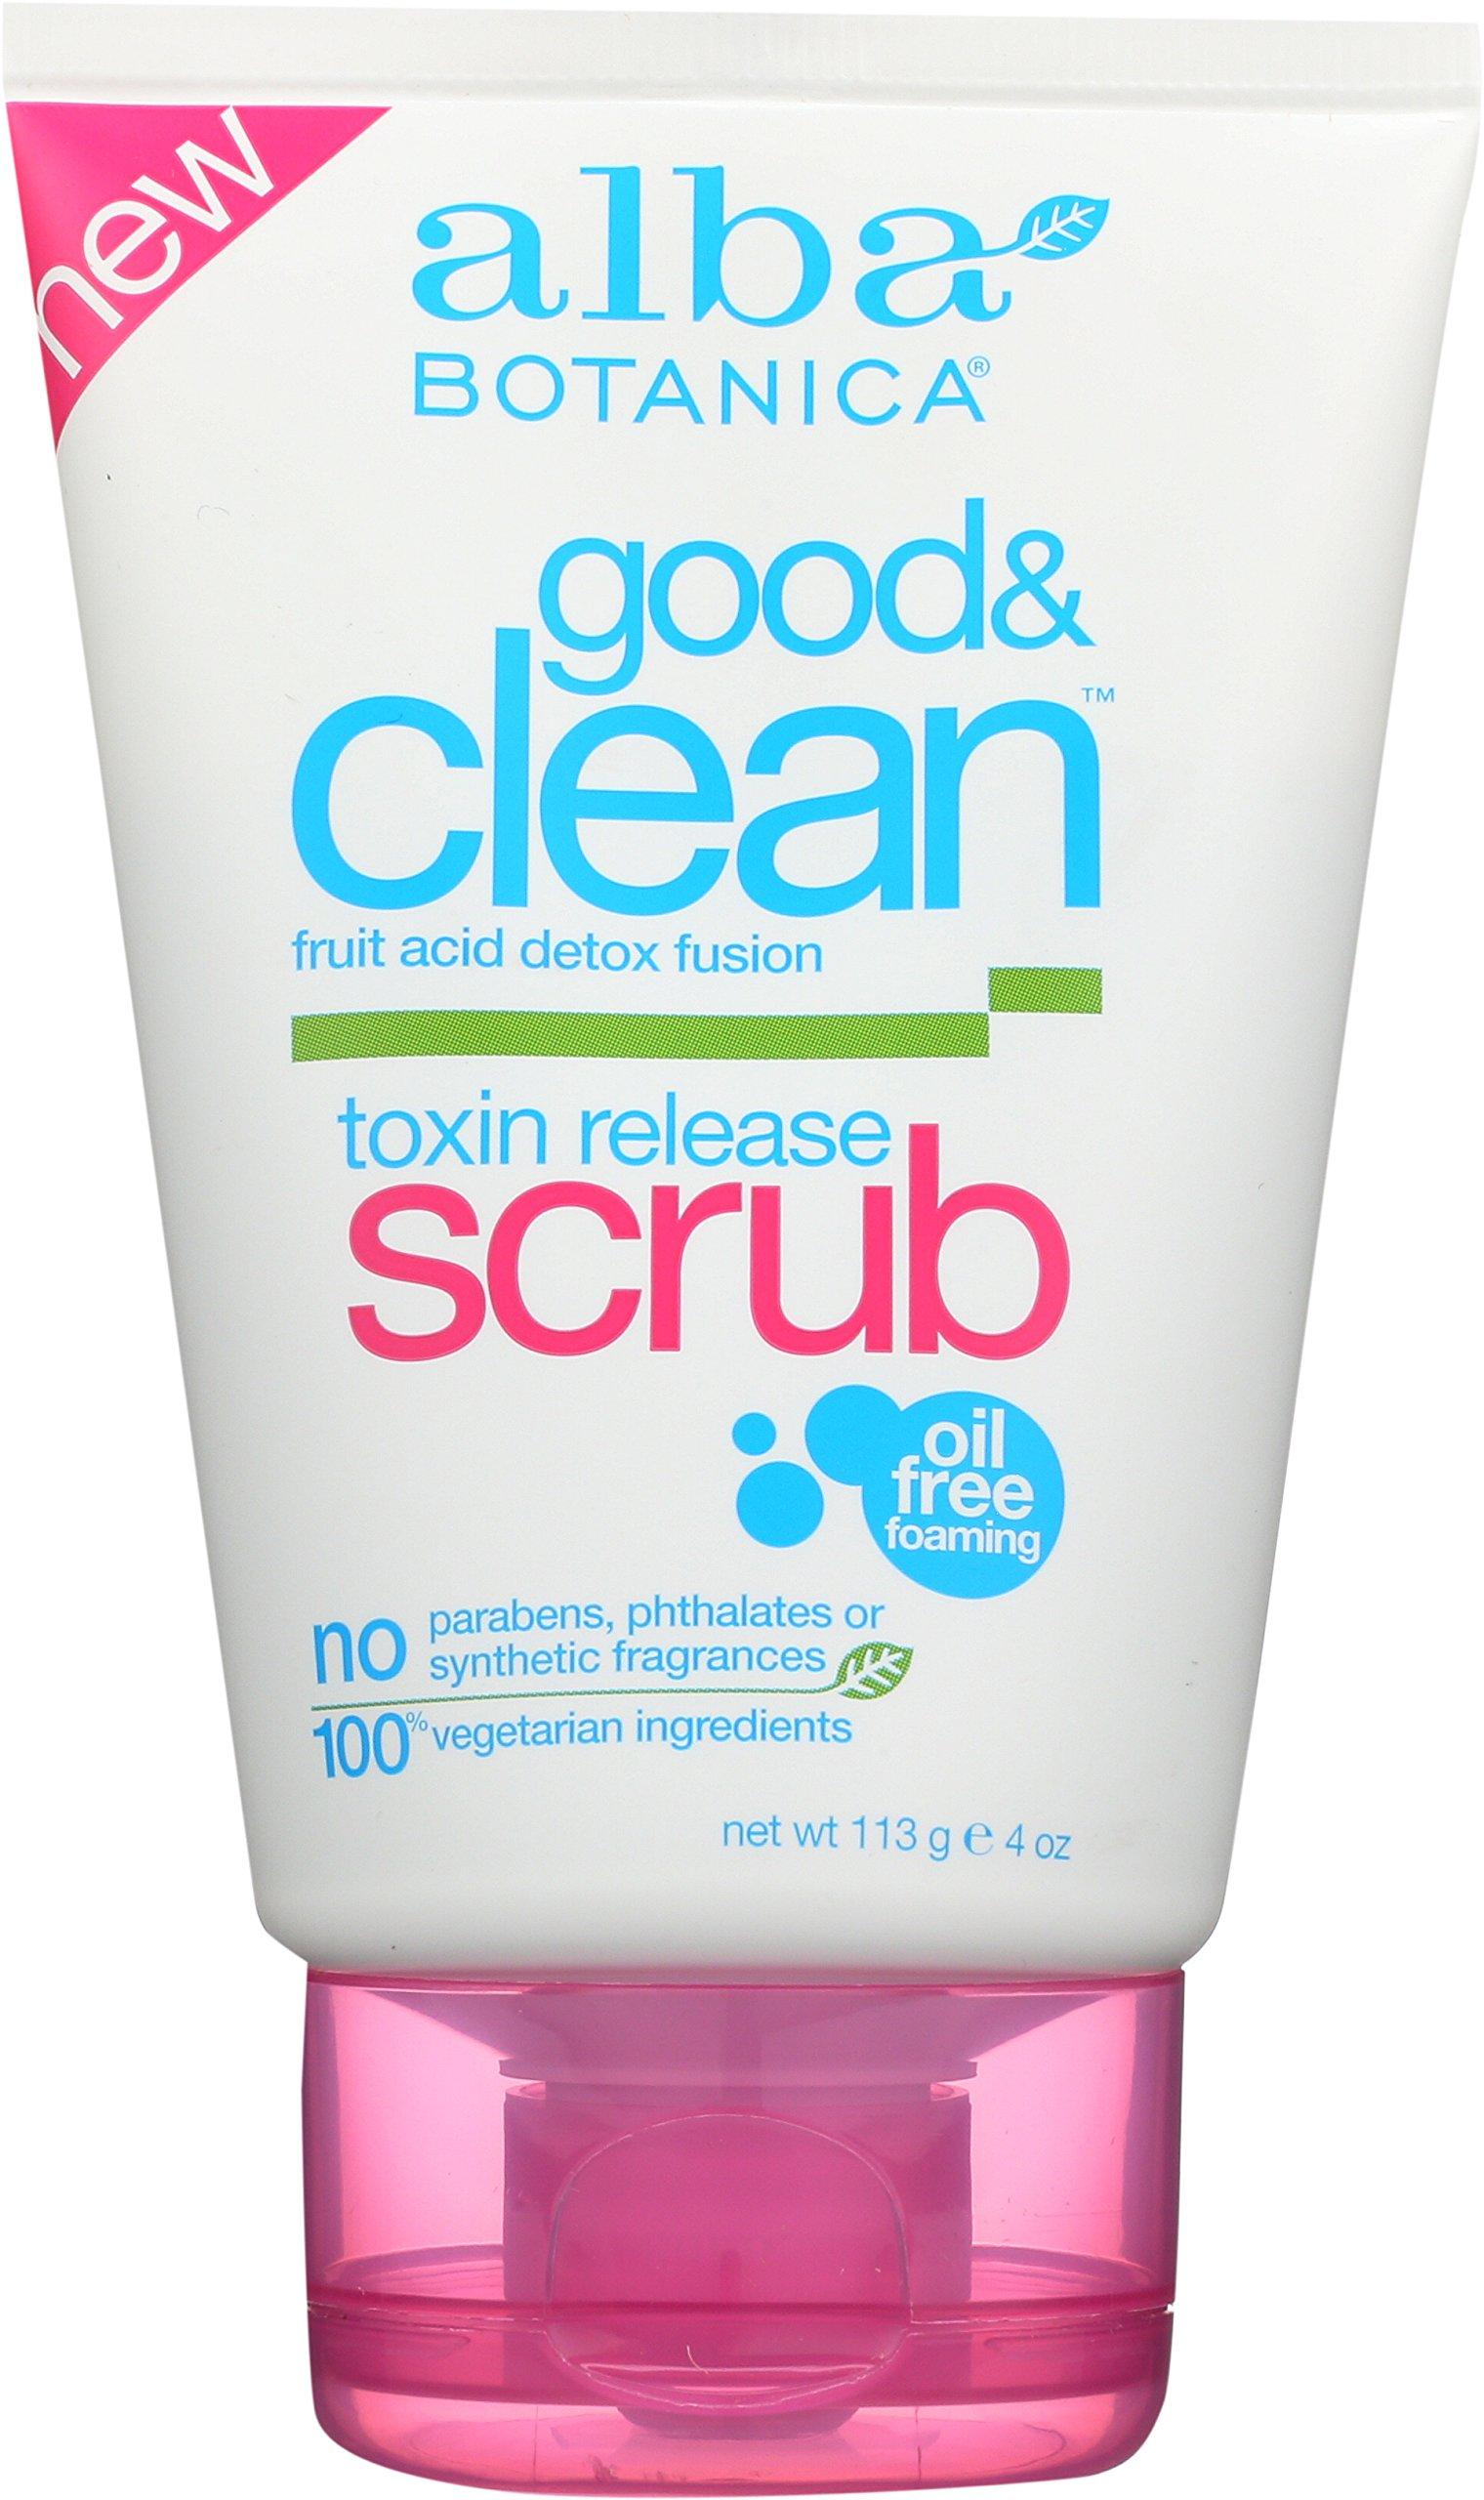 Alba Botanica Good and Clean Toxin Release Scrub, 4 Ounce